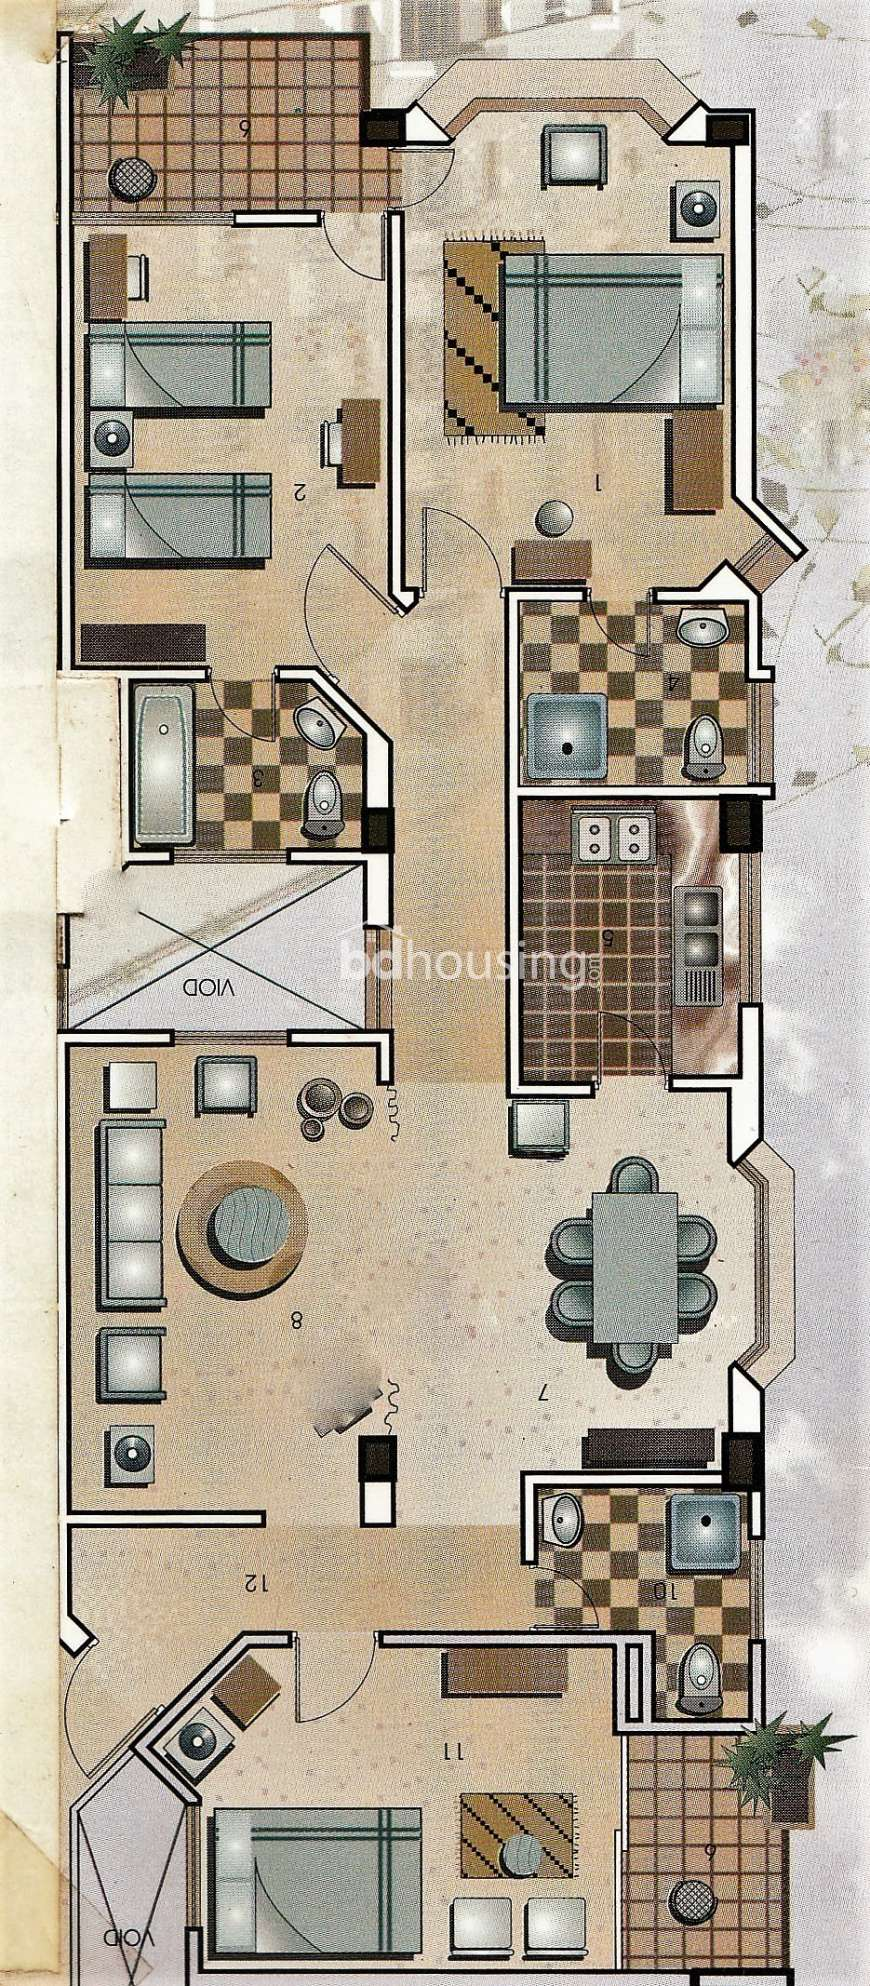 1500 Sqft 3 Beds Ready Apartment Flats For Sale At Kalabagan